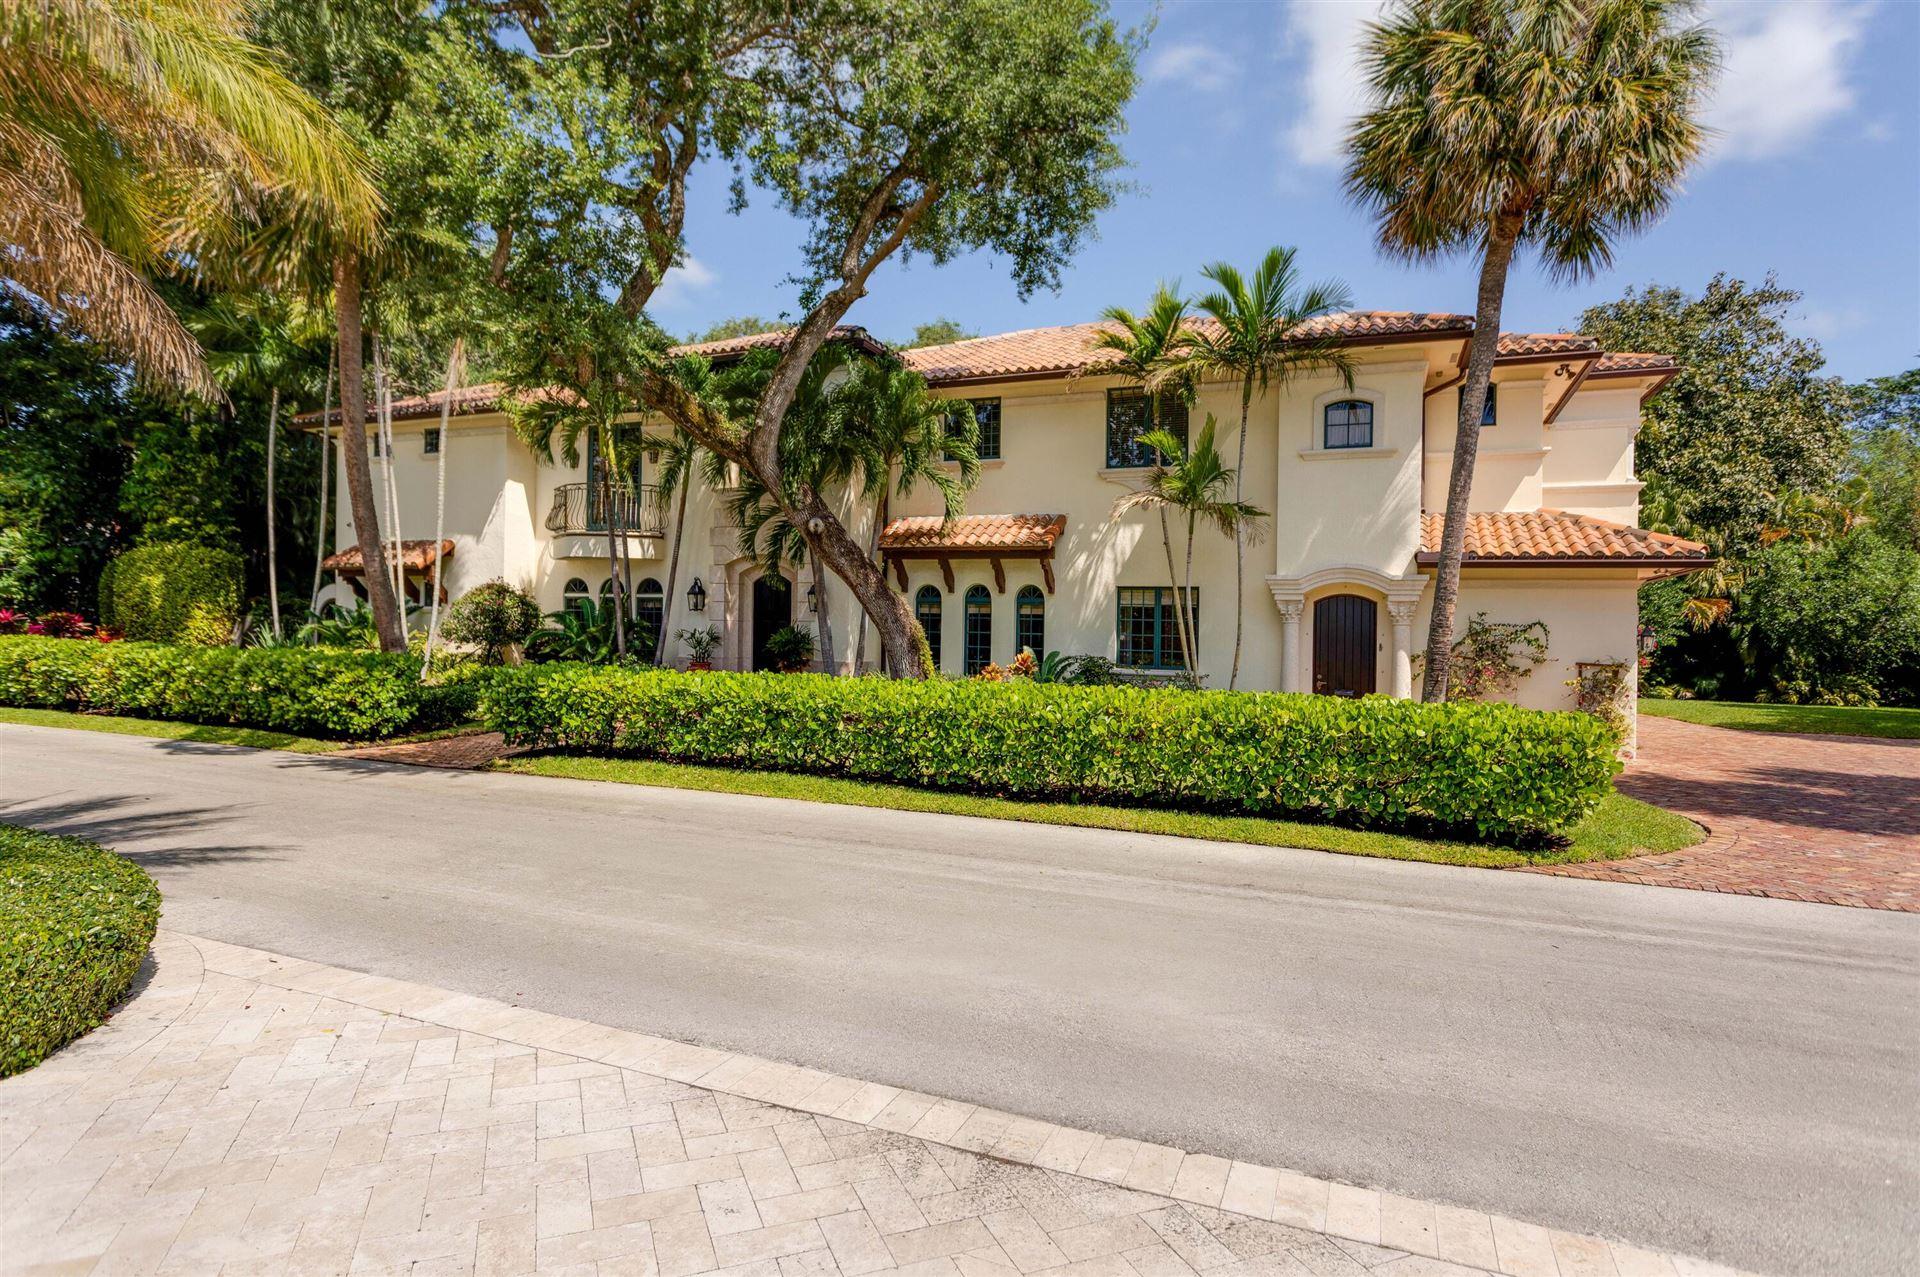 745 Oleander Street, Boca Raton, FL 33486 - #: RX-10707840